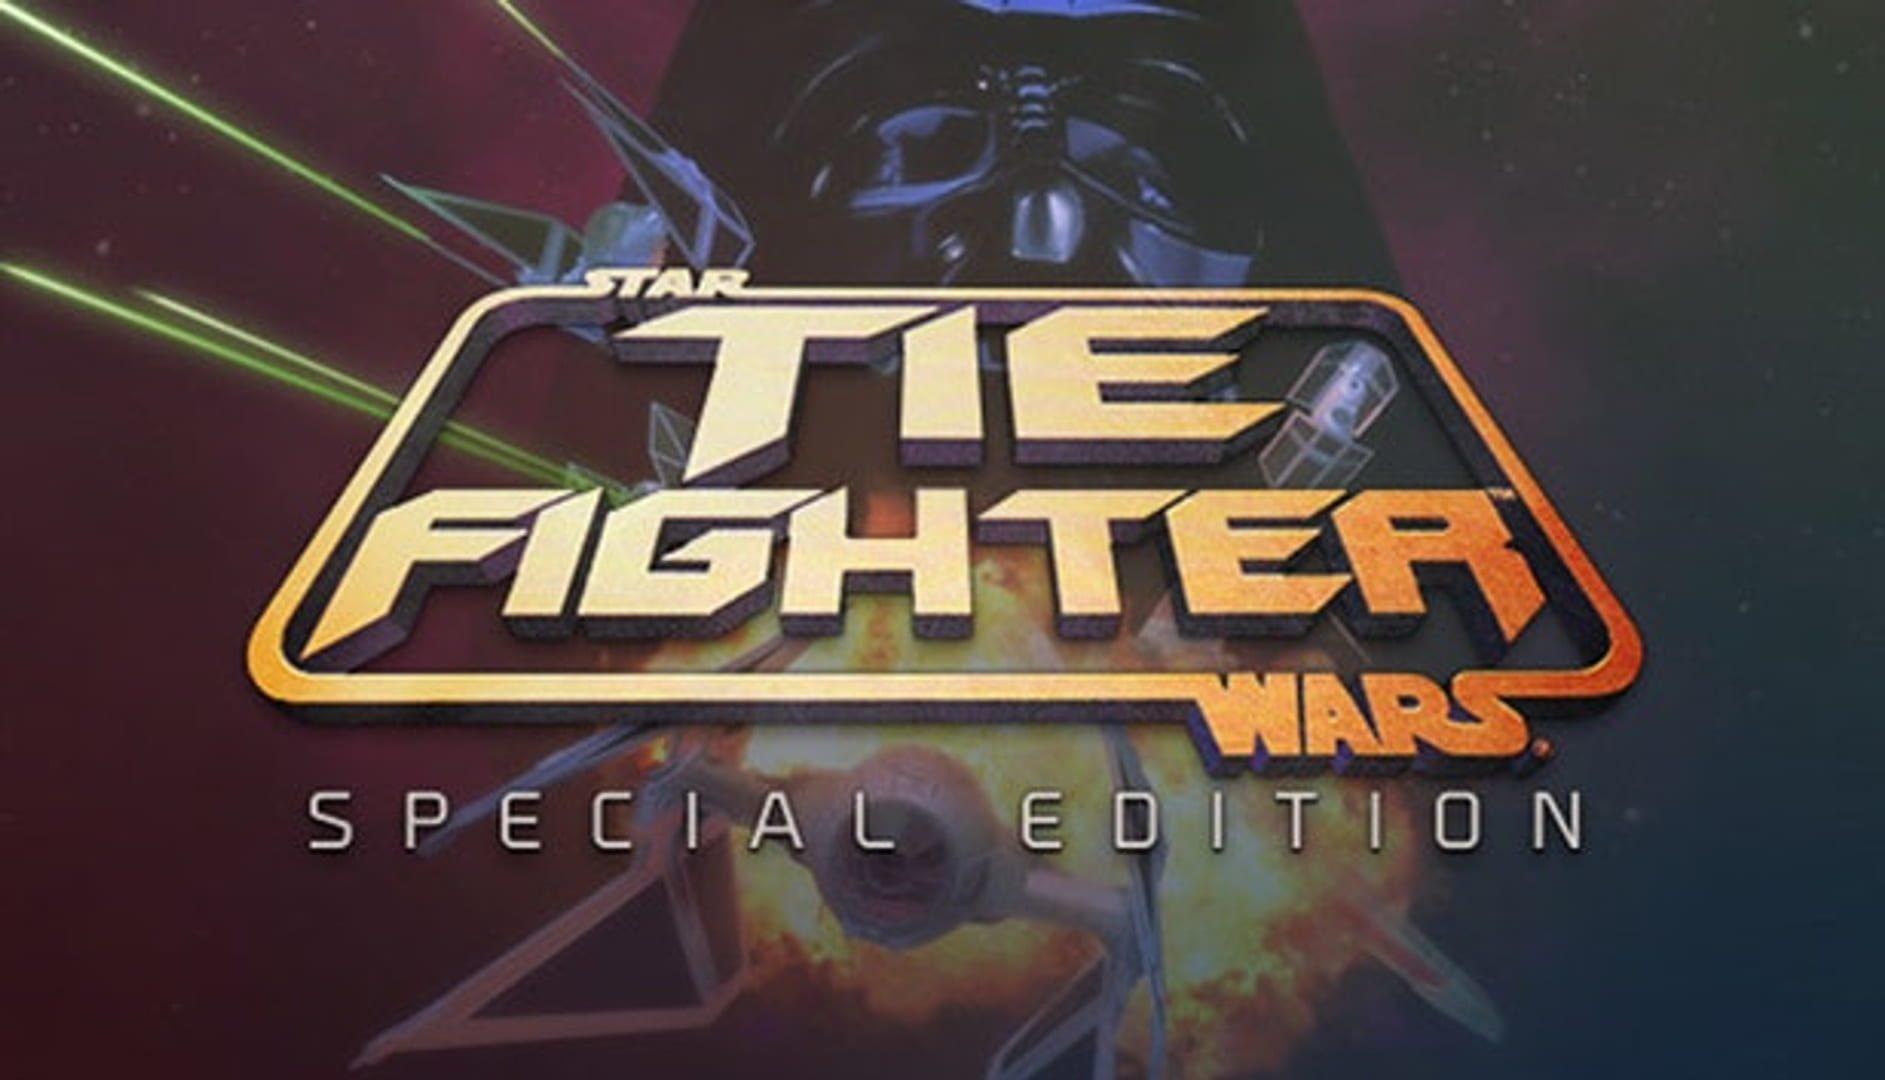 buy Star Wars: TIE Fighter - Special Edition cd key for all platform